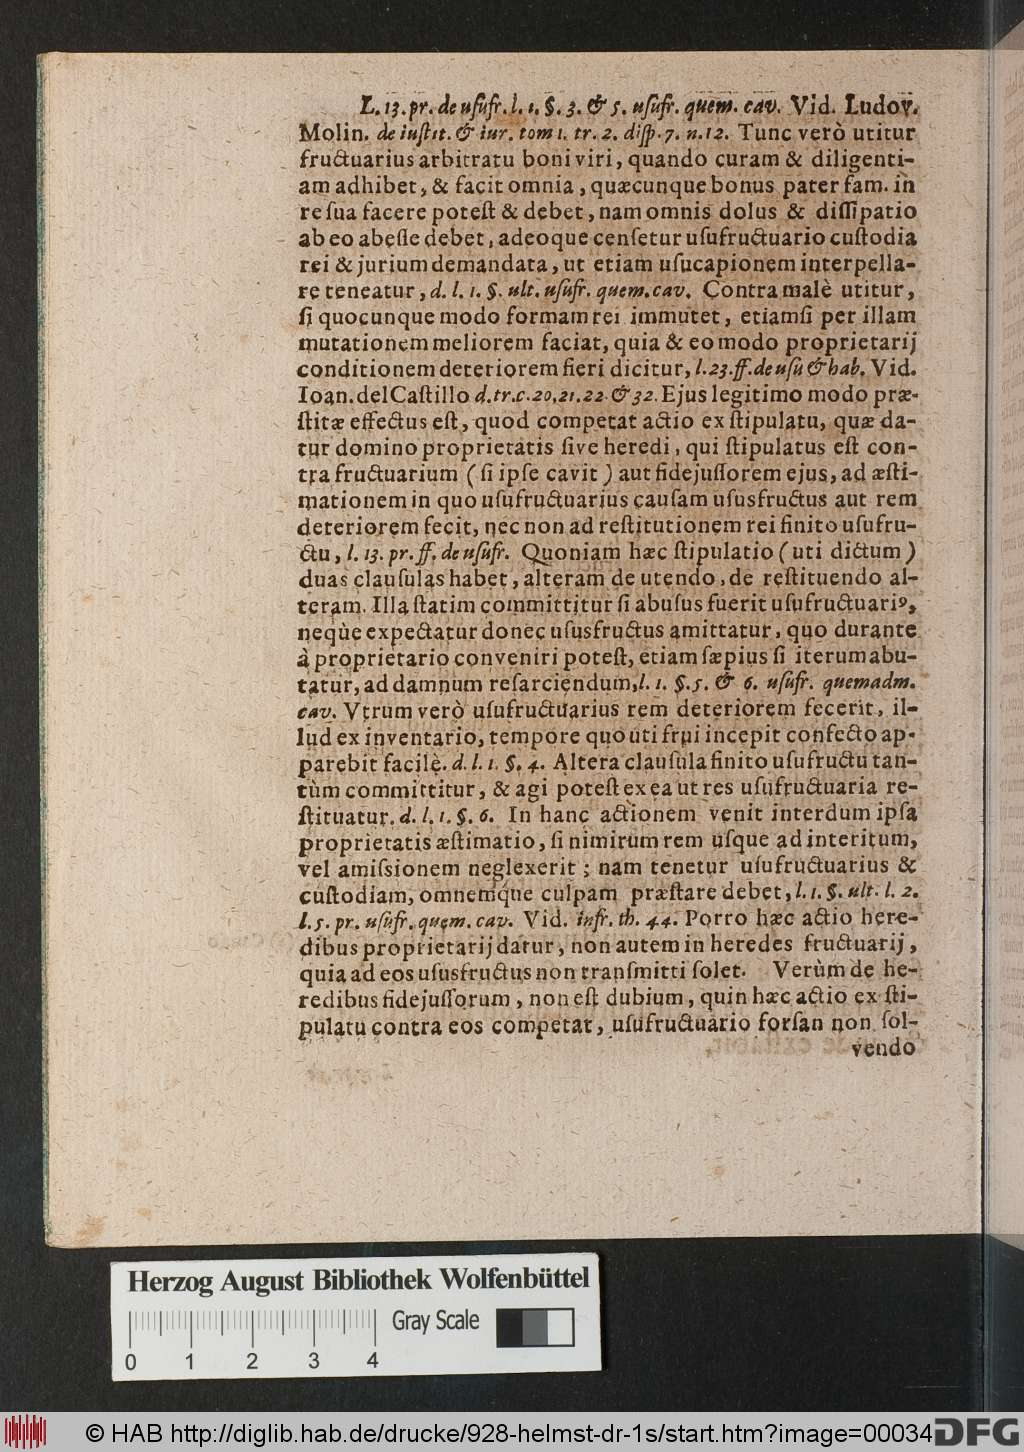 https://diglib.hab.de/drucke/928-helmst-dr-1s/00034.jpg